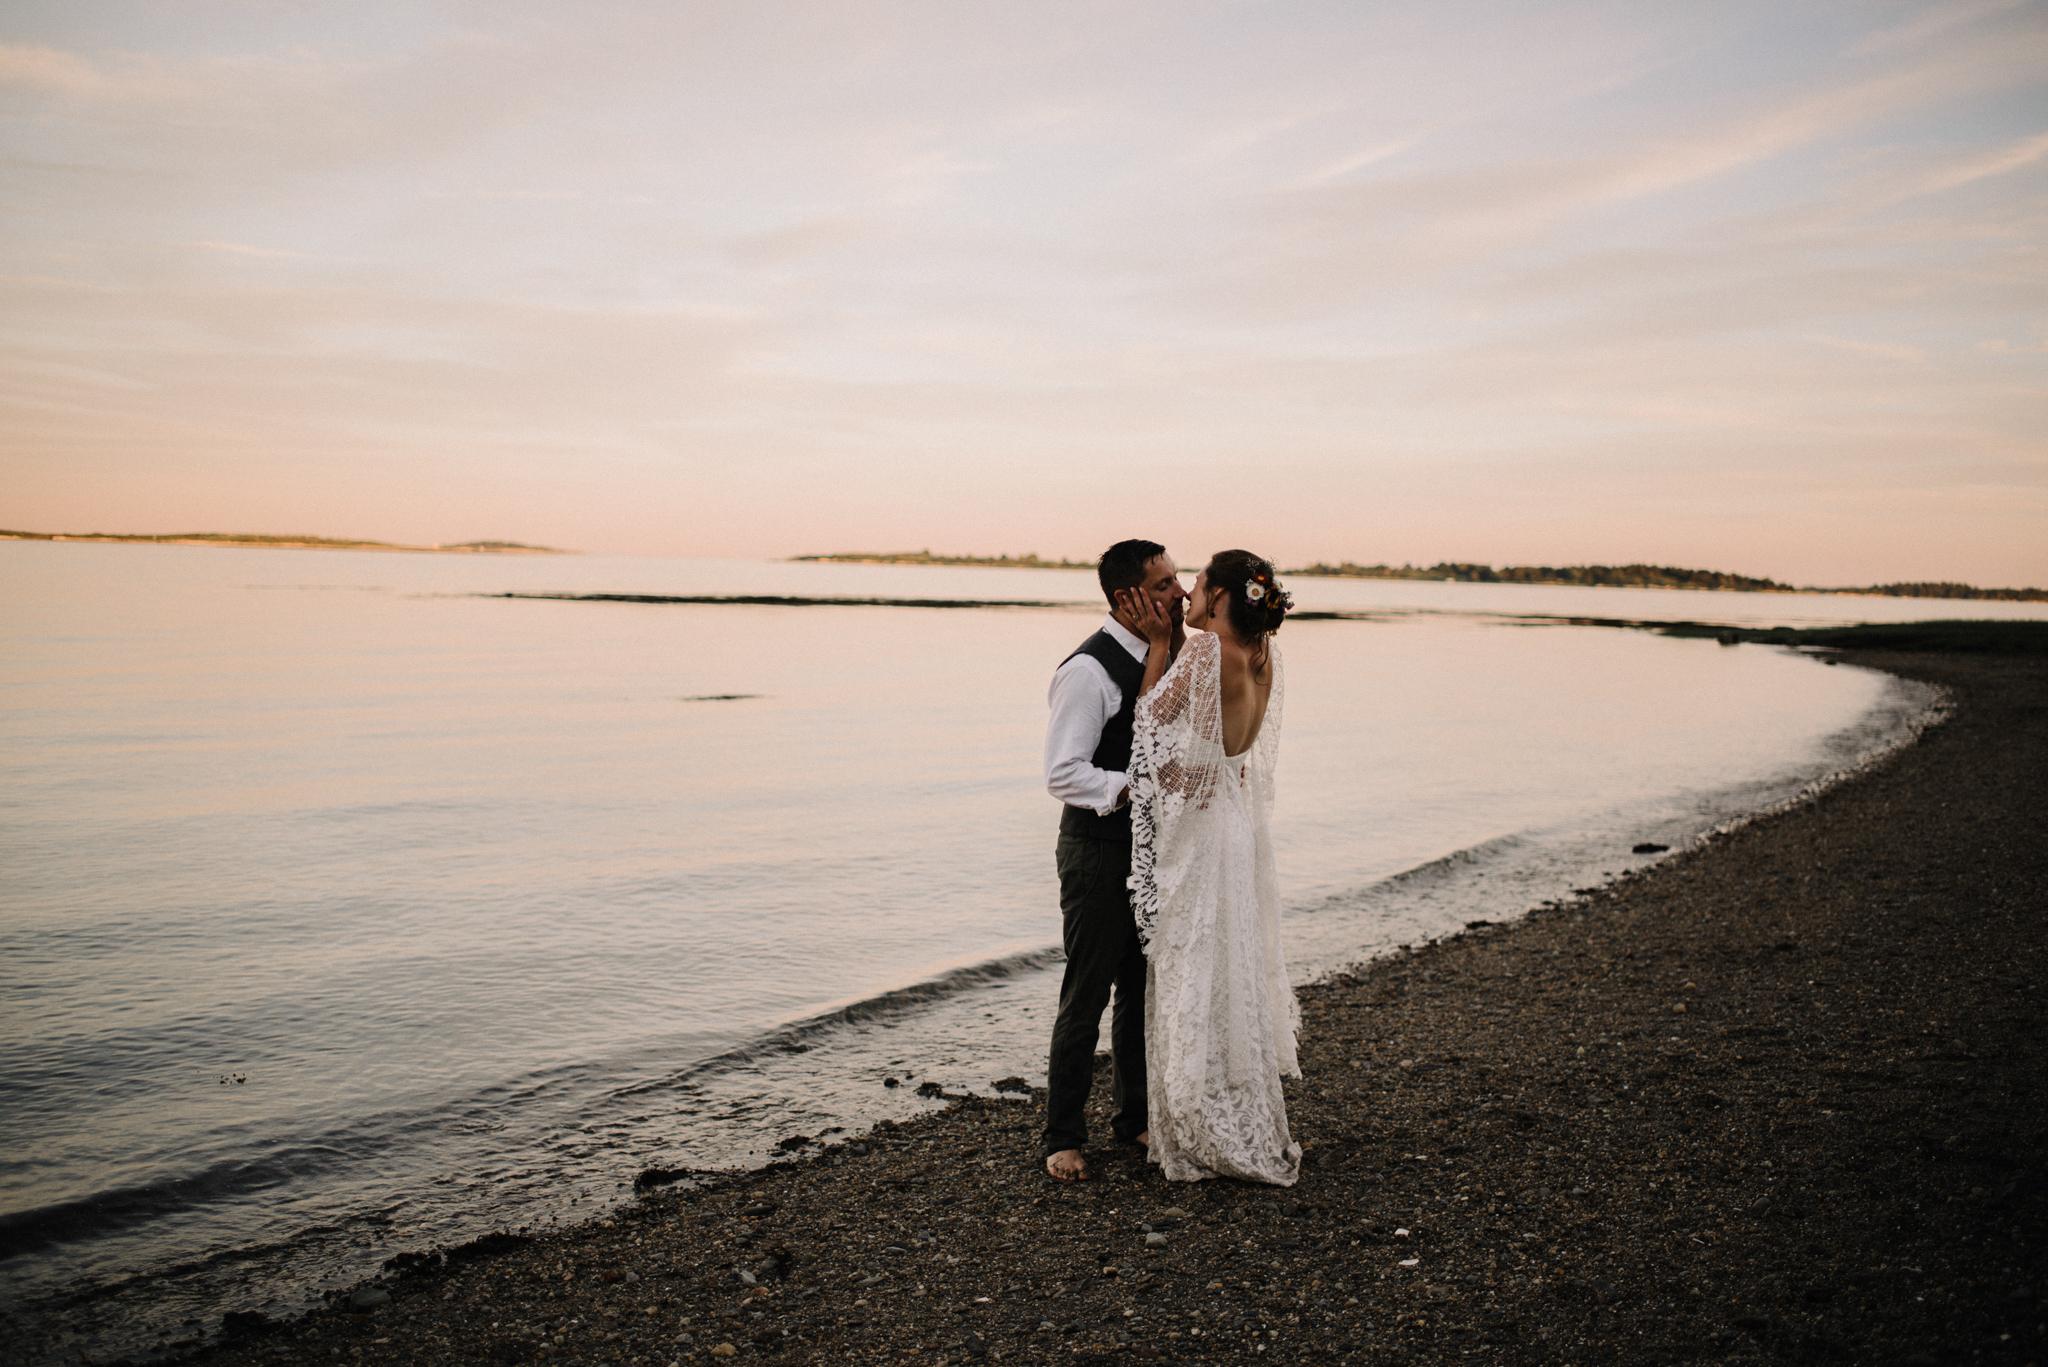 Damian and Jesse Chebeague Island Maine Backyard Destination Beach Wedding White Sails Creative_26.JPG